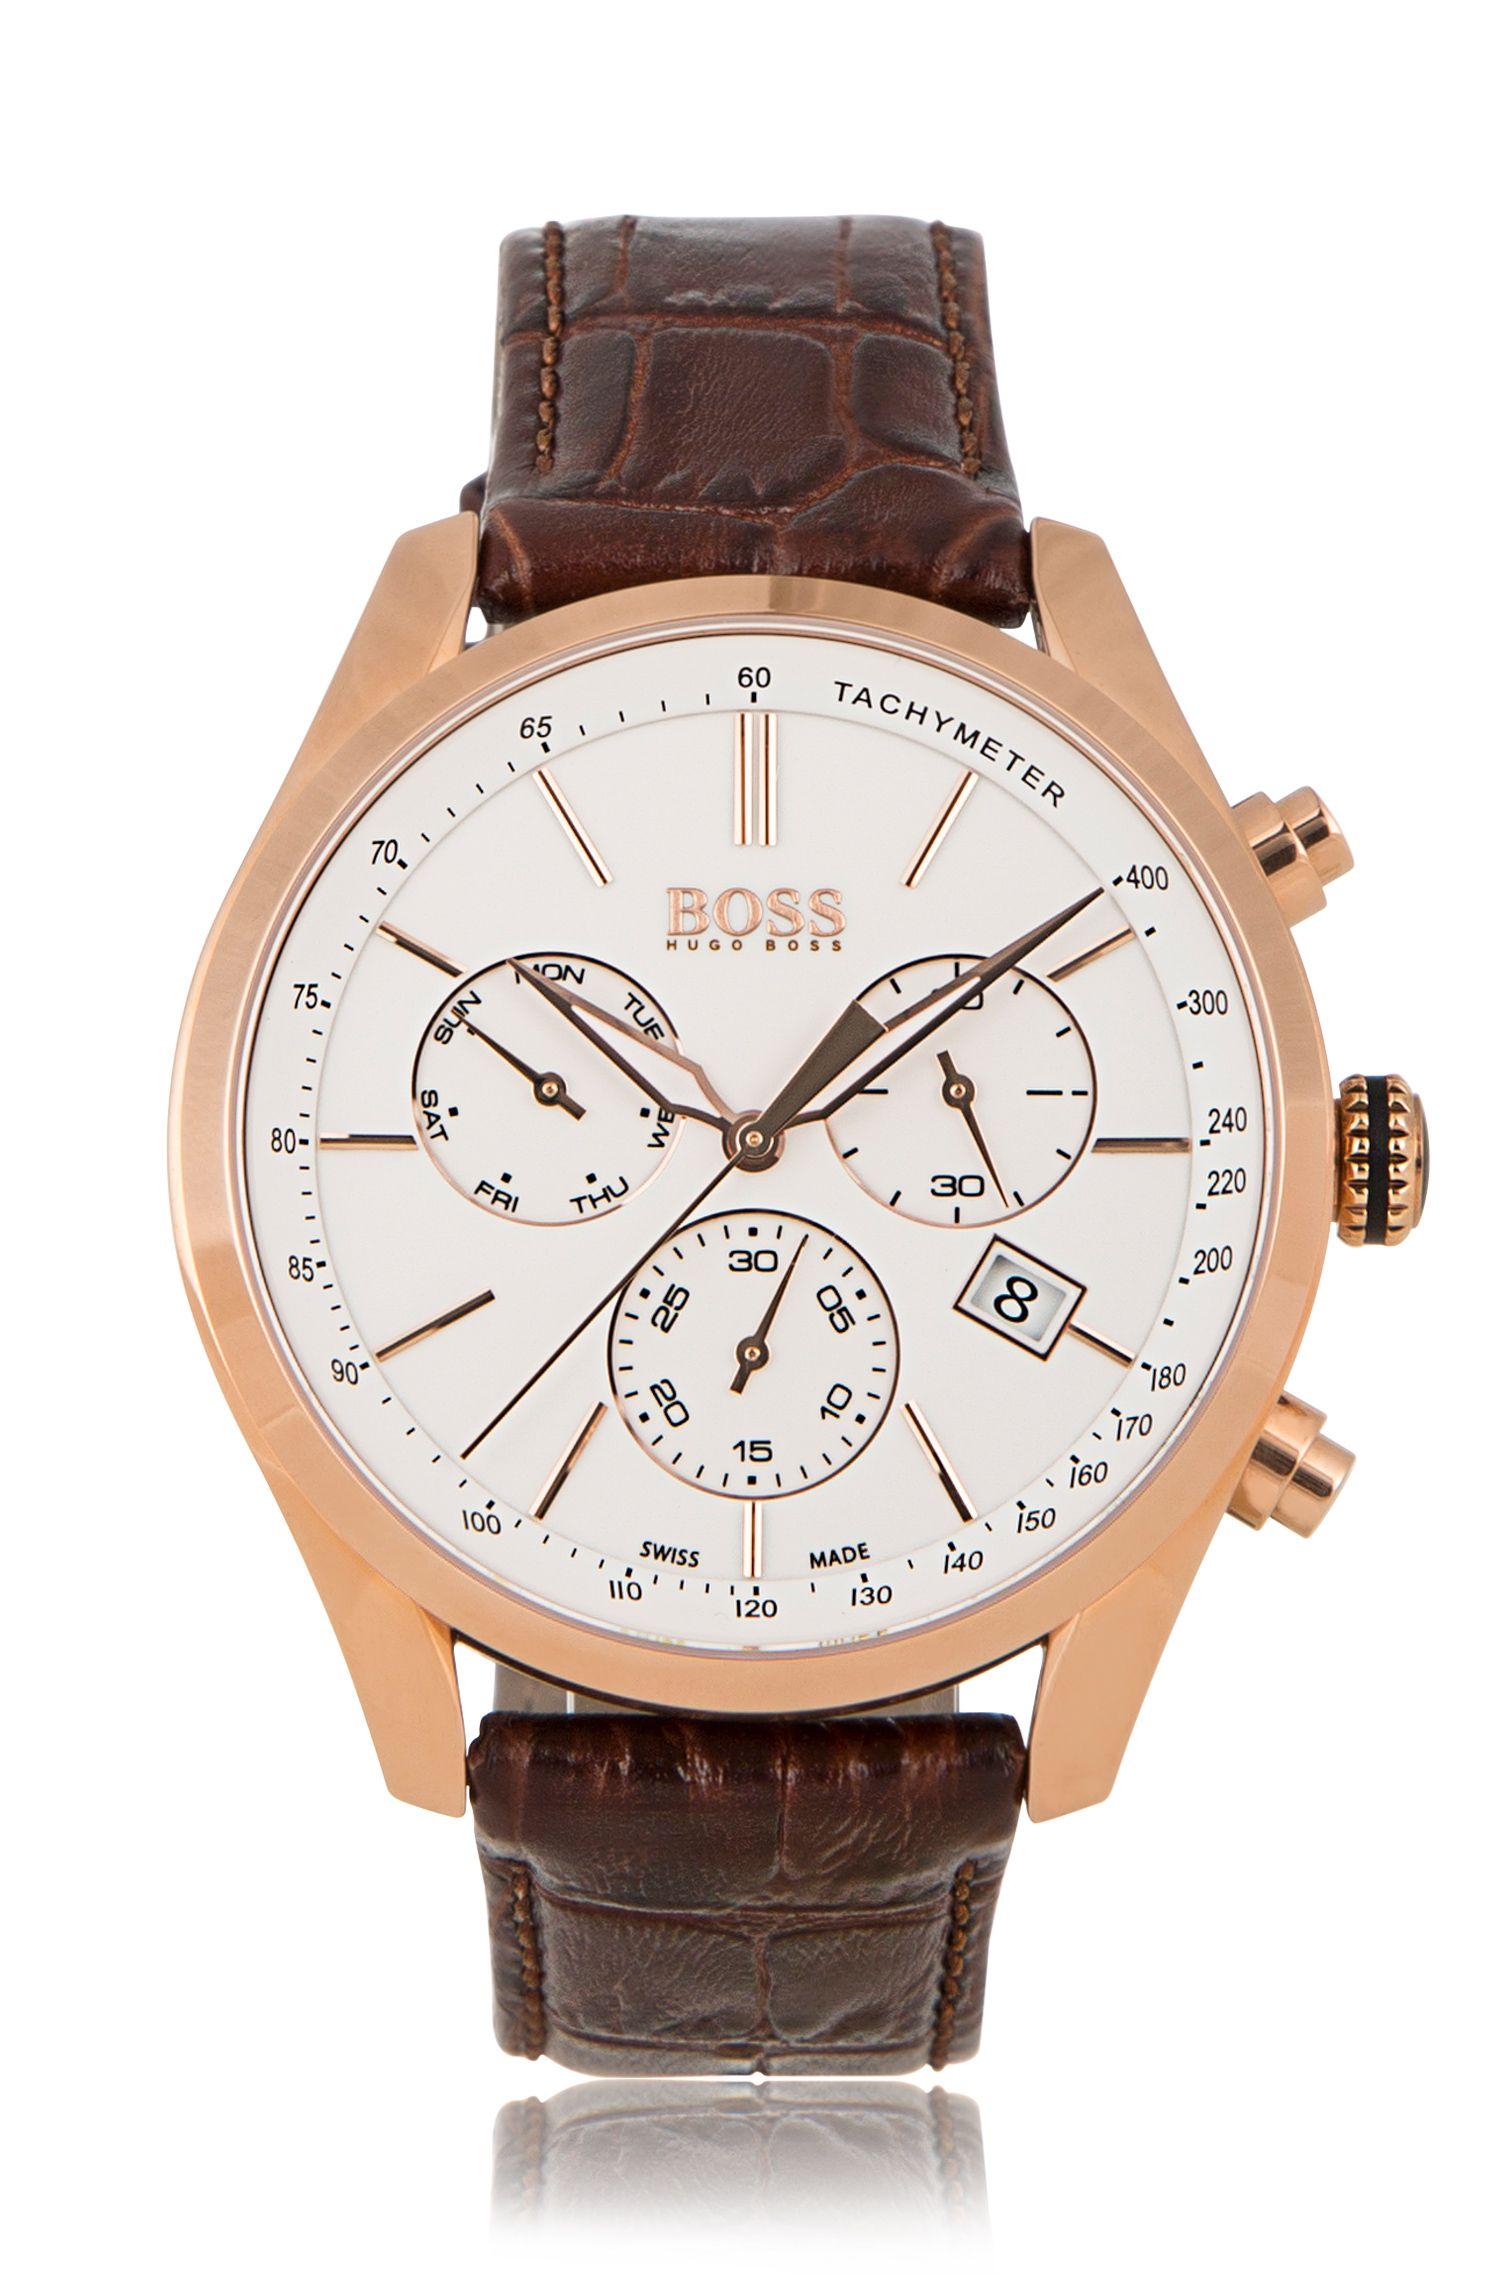 Chronograph with quartz movement and leather strap: 'BOSS Signature Timepiece Chrono'